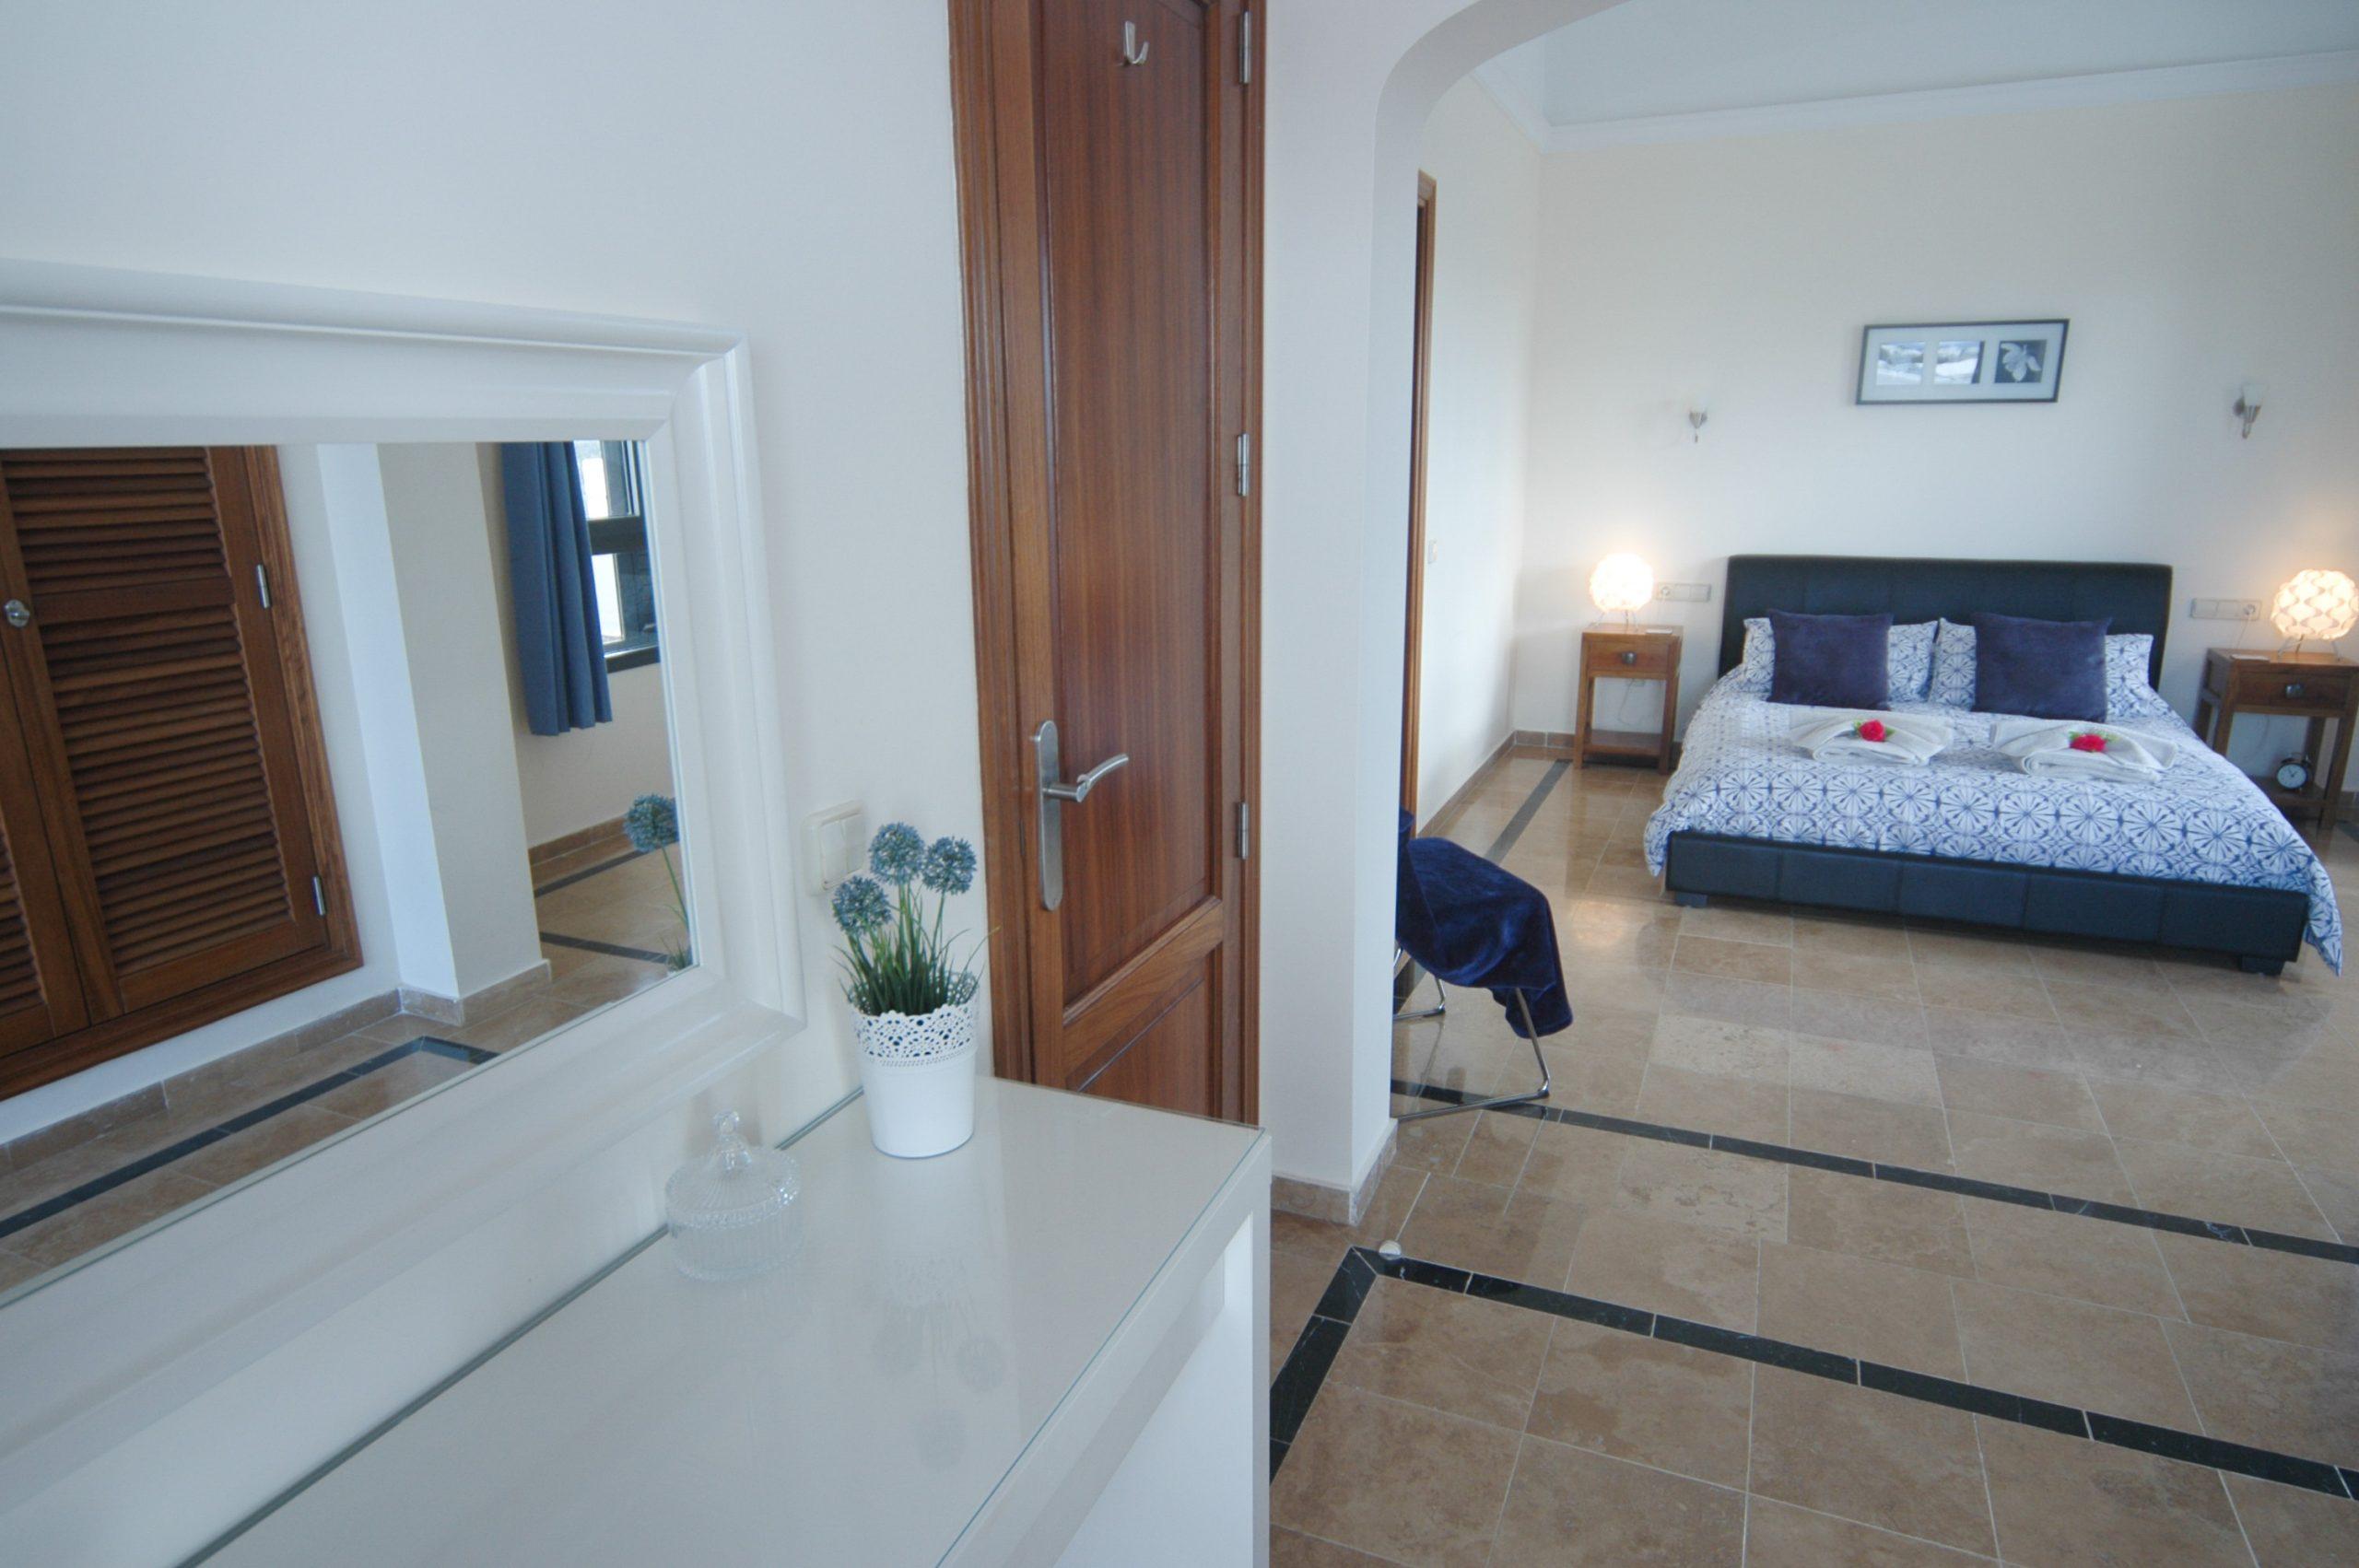 Villa_LVC338912 - Playa Blanca Villa master bedroom with sun balcony